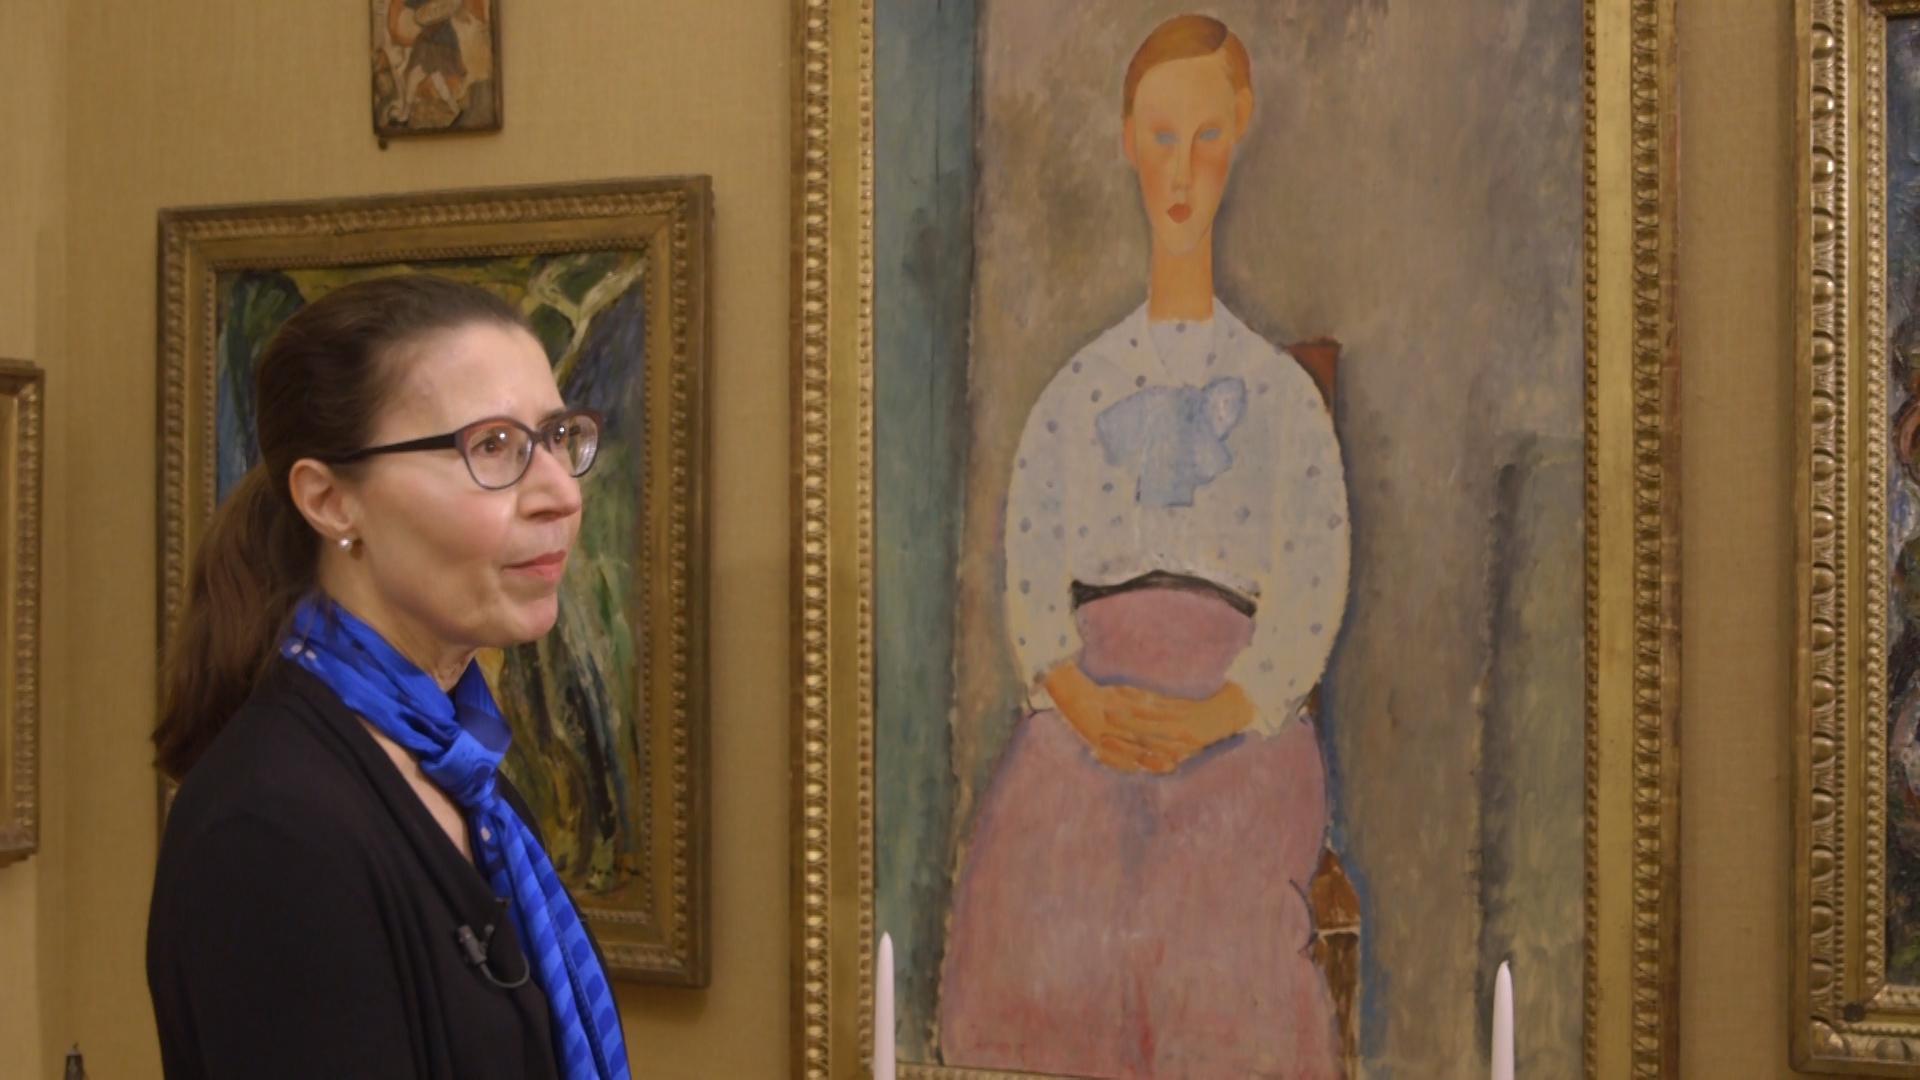 Modigliani - Amedeo Modigliani died a broken man. His art, especially the sculptures, have endured.Season 1, Episode 12